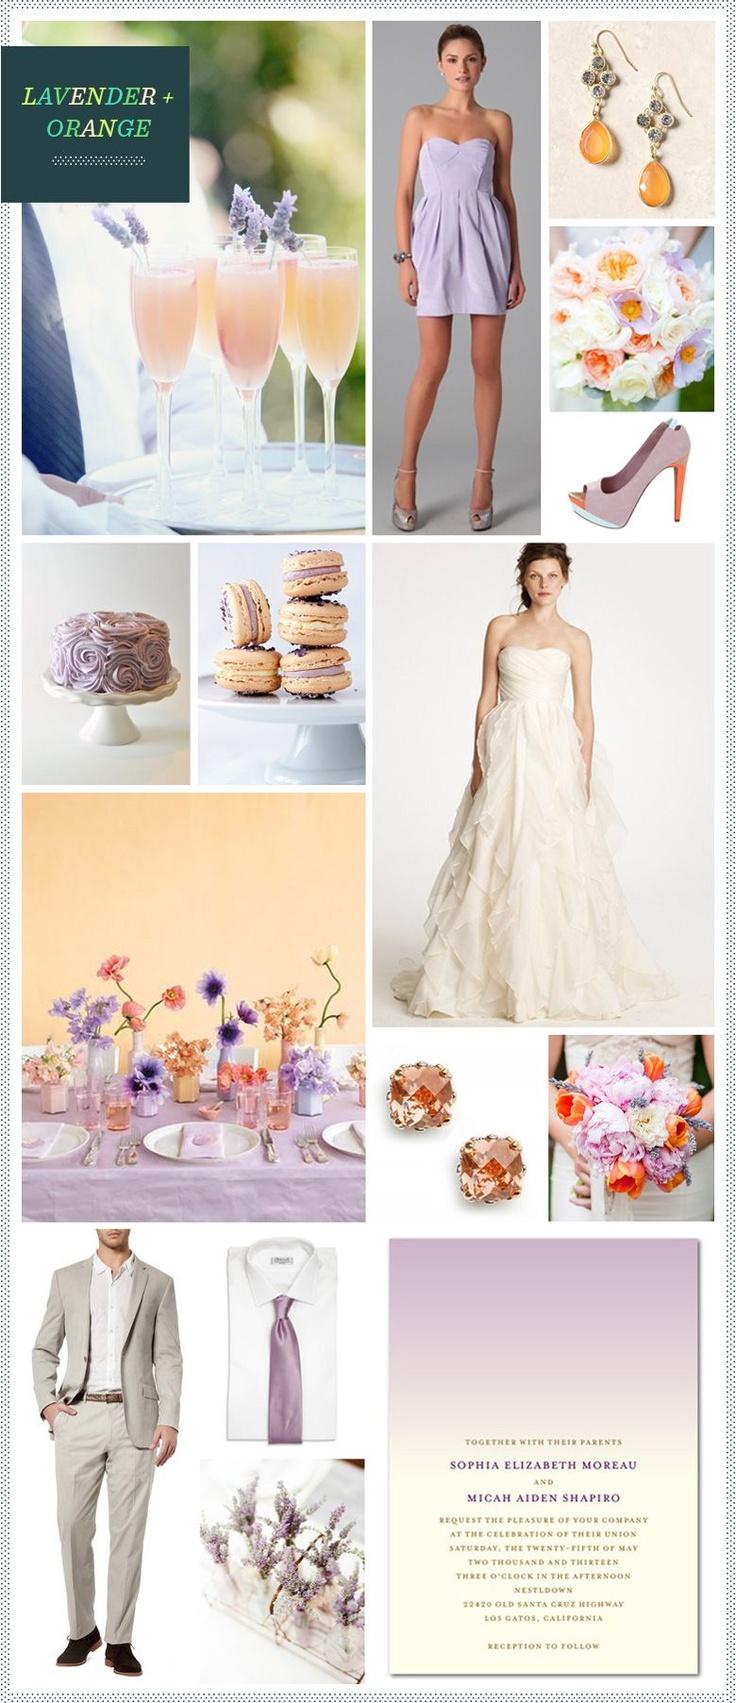 107 best Wedding ideas images on Pinterest | Weddings, Wedding ...